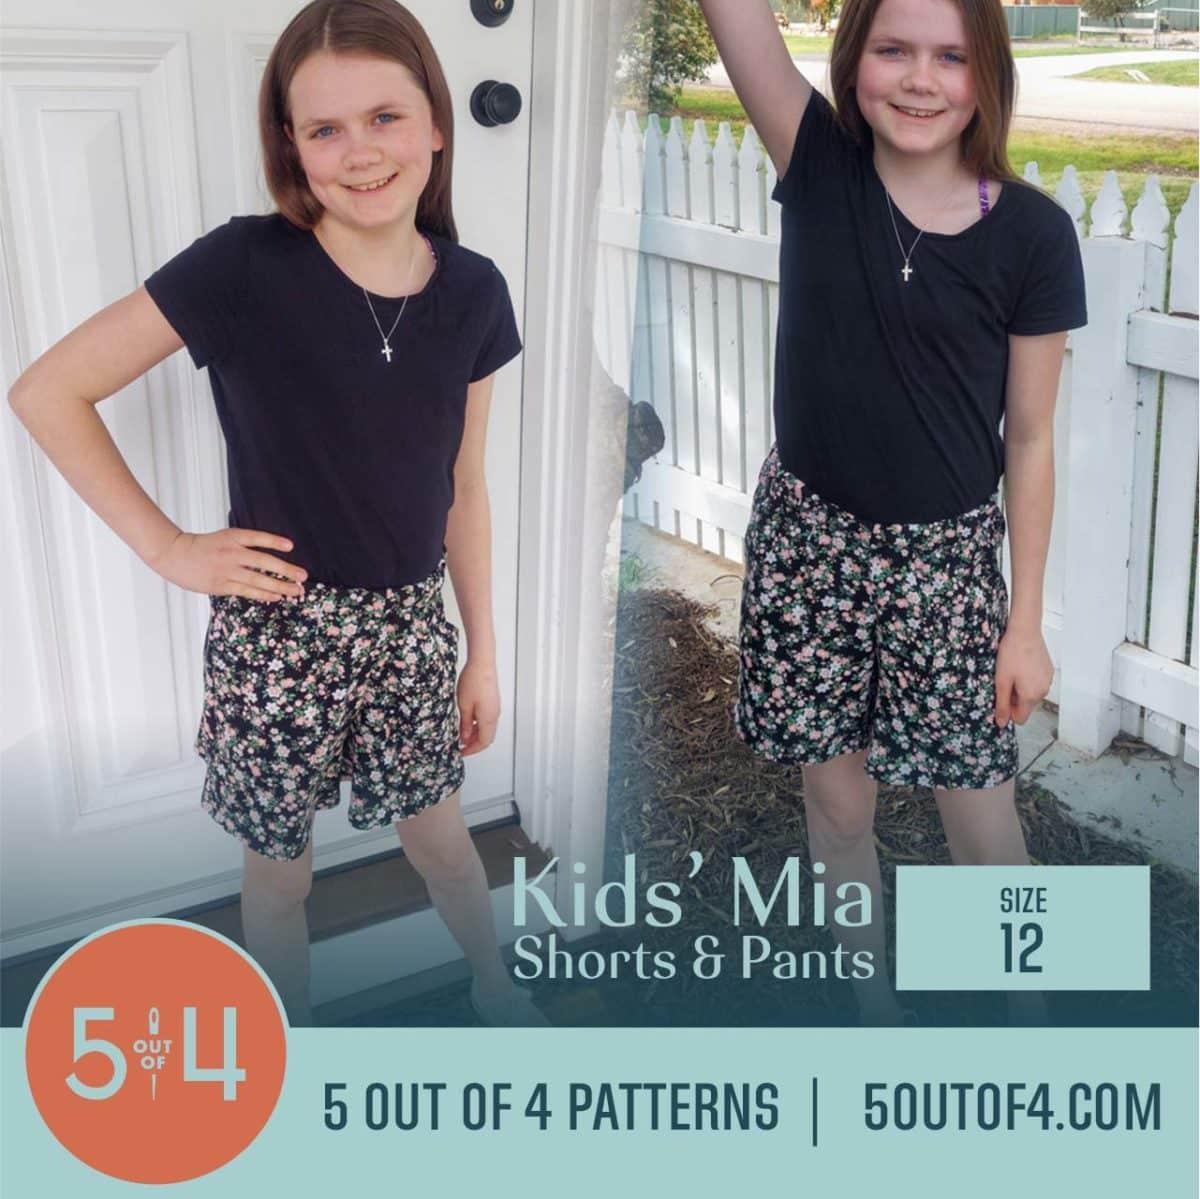 5oo4 Patterns Kids' Mia Pants Size 12